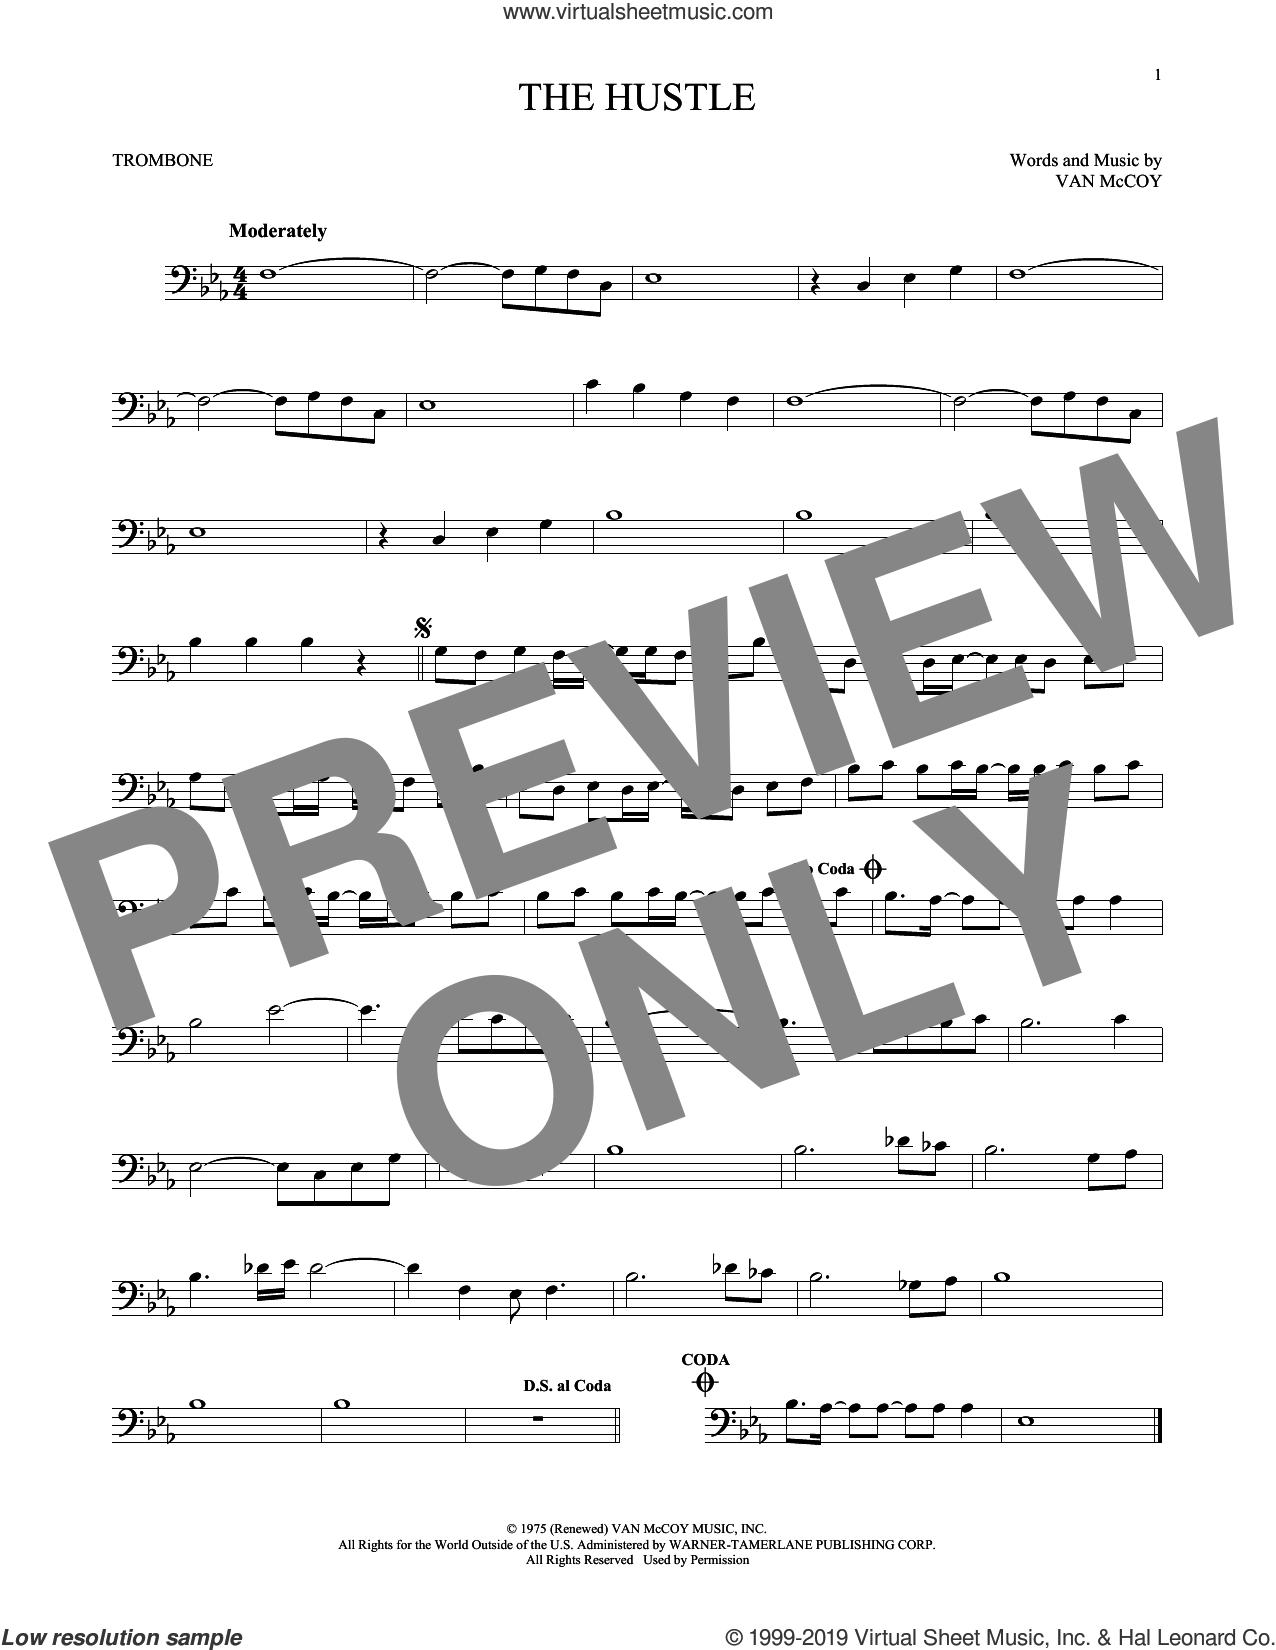 The Hustle sheet music for trombone solo by Van McCoy & The Soul City Symphony and Van McCoy, intermediate skill level